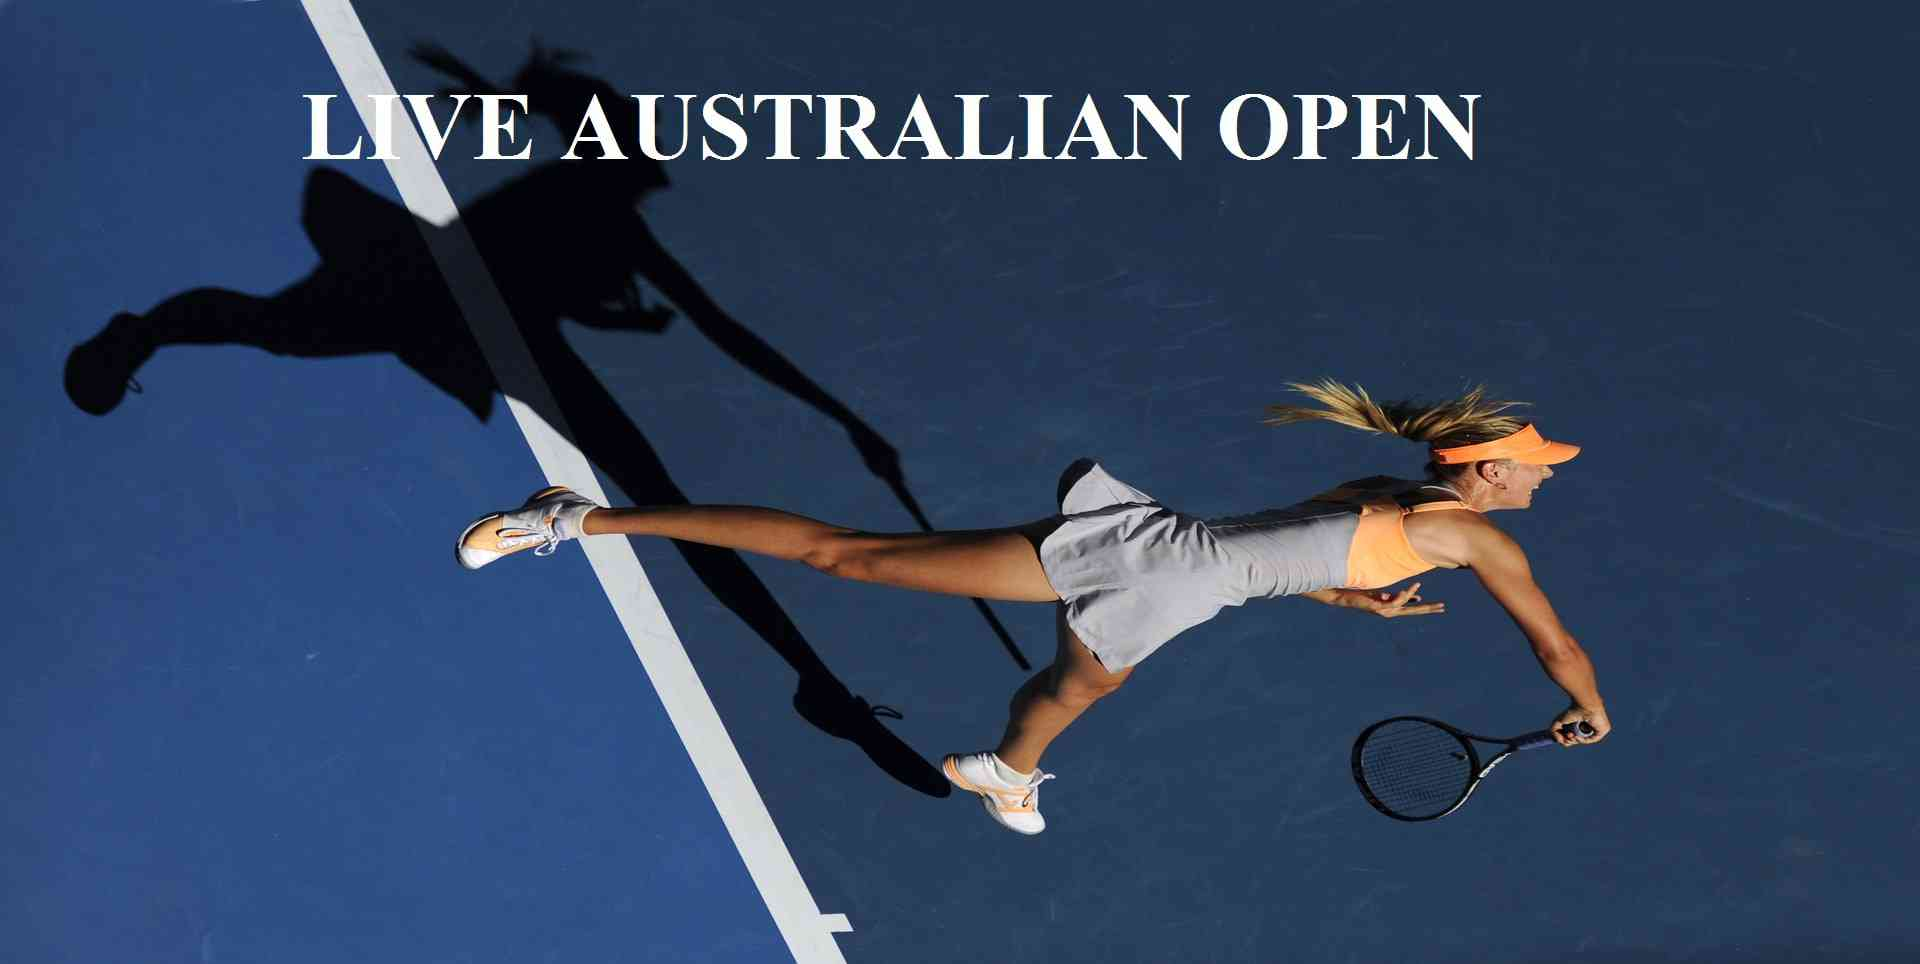 Watch Jurgen Melzer vs Roger Federer Round 1 Australian Open 2017 Live